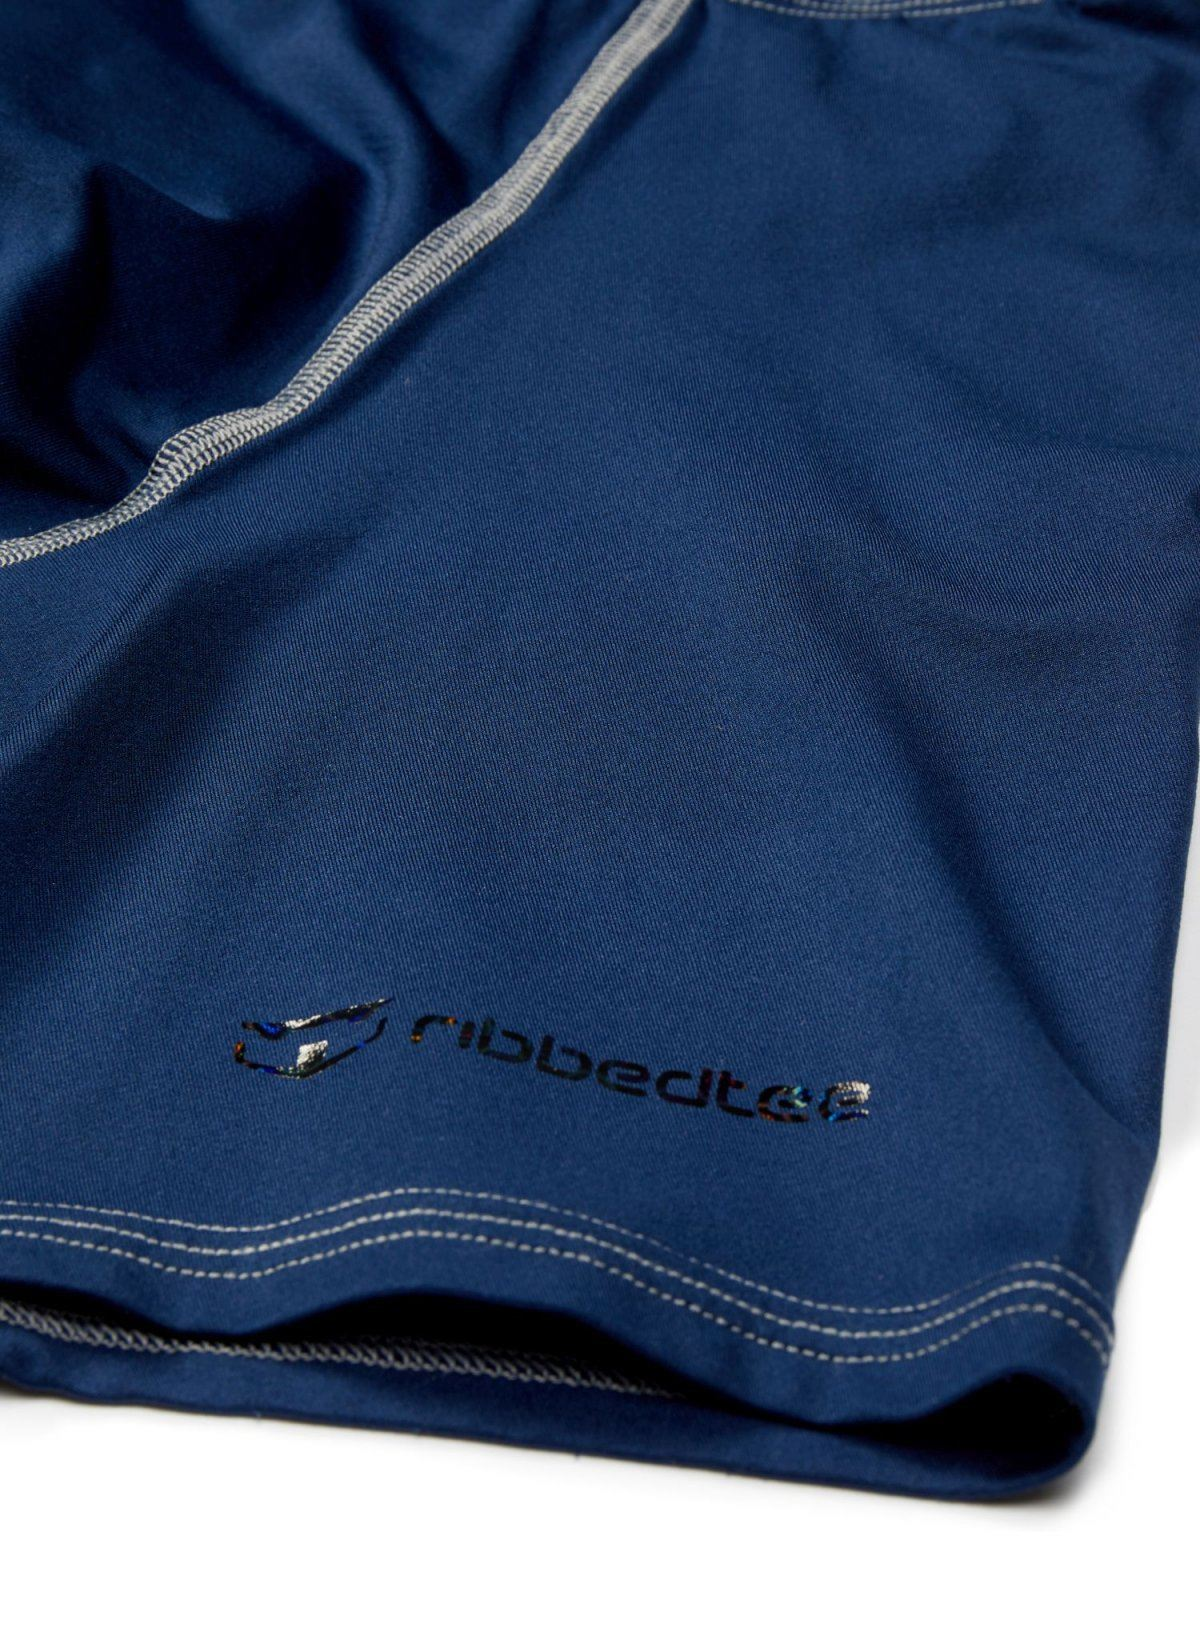 CoolNylon fabric